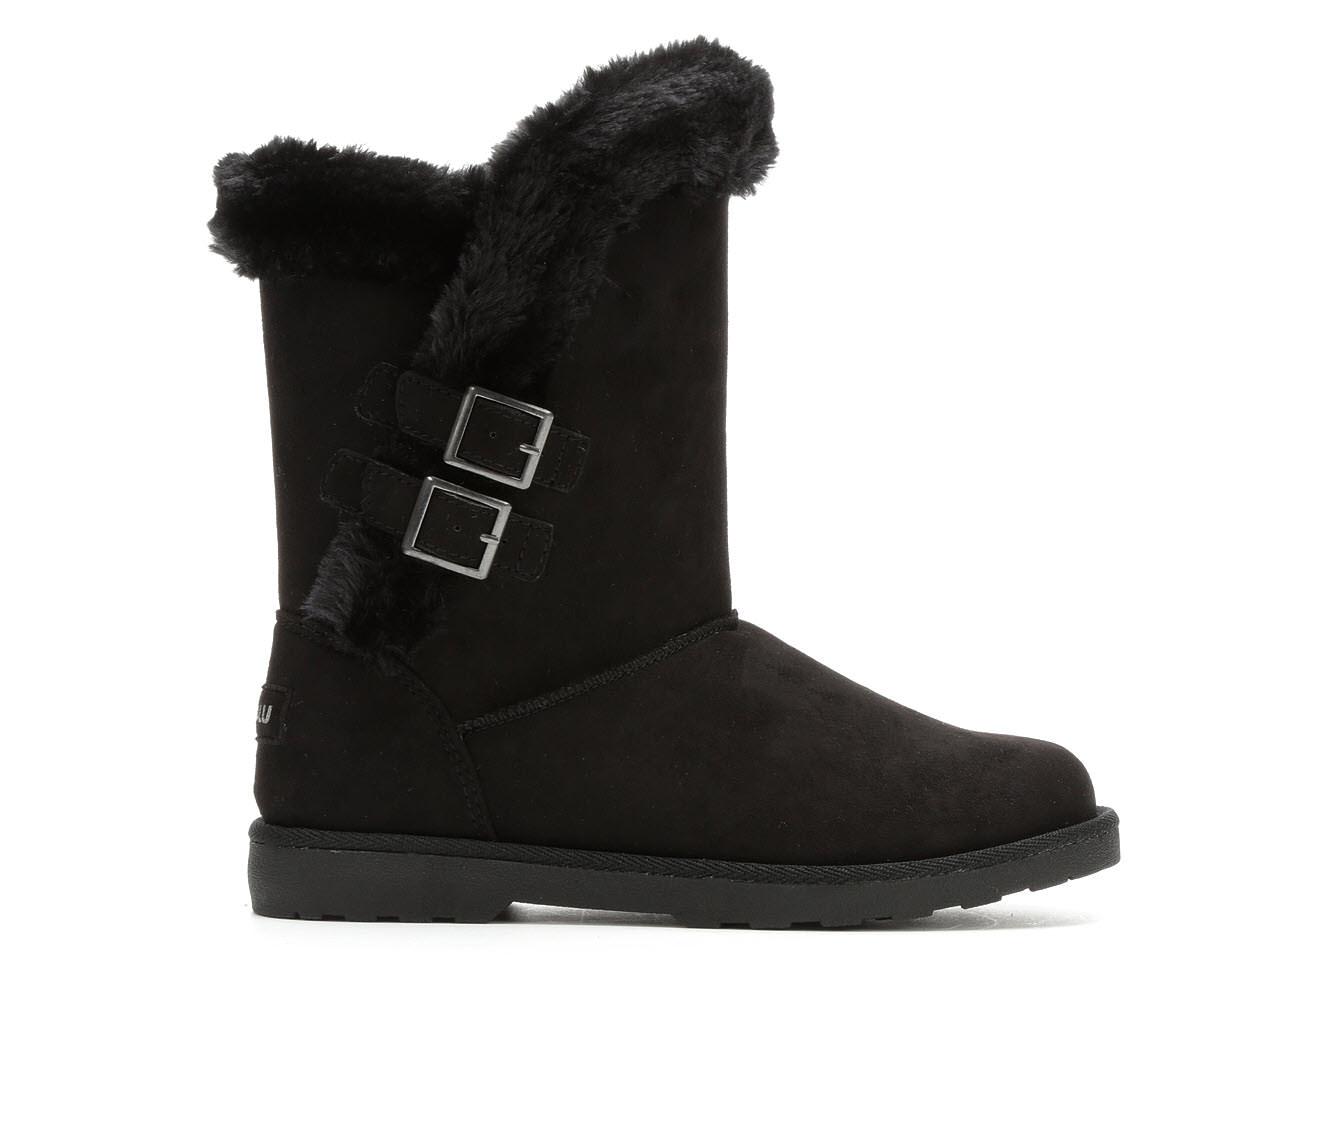 Makalu Gracia Women's Boot (Black Canvas)